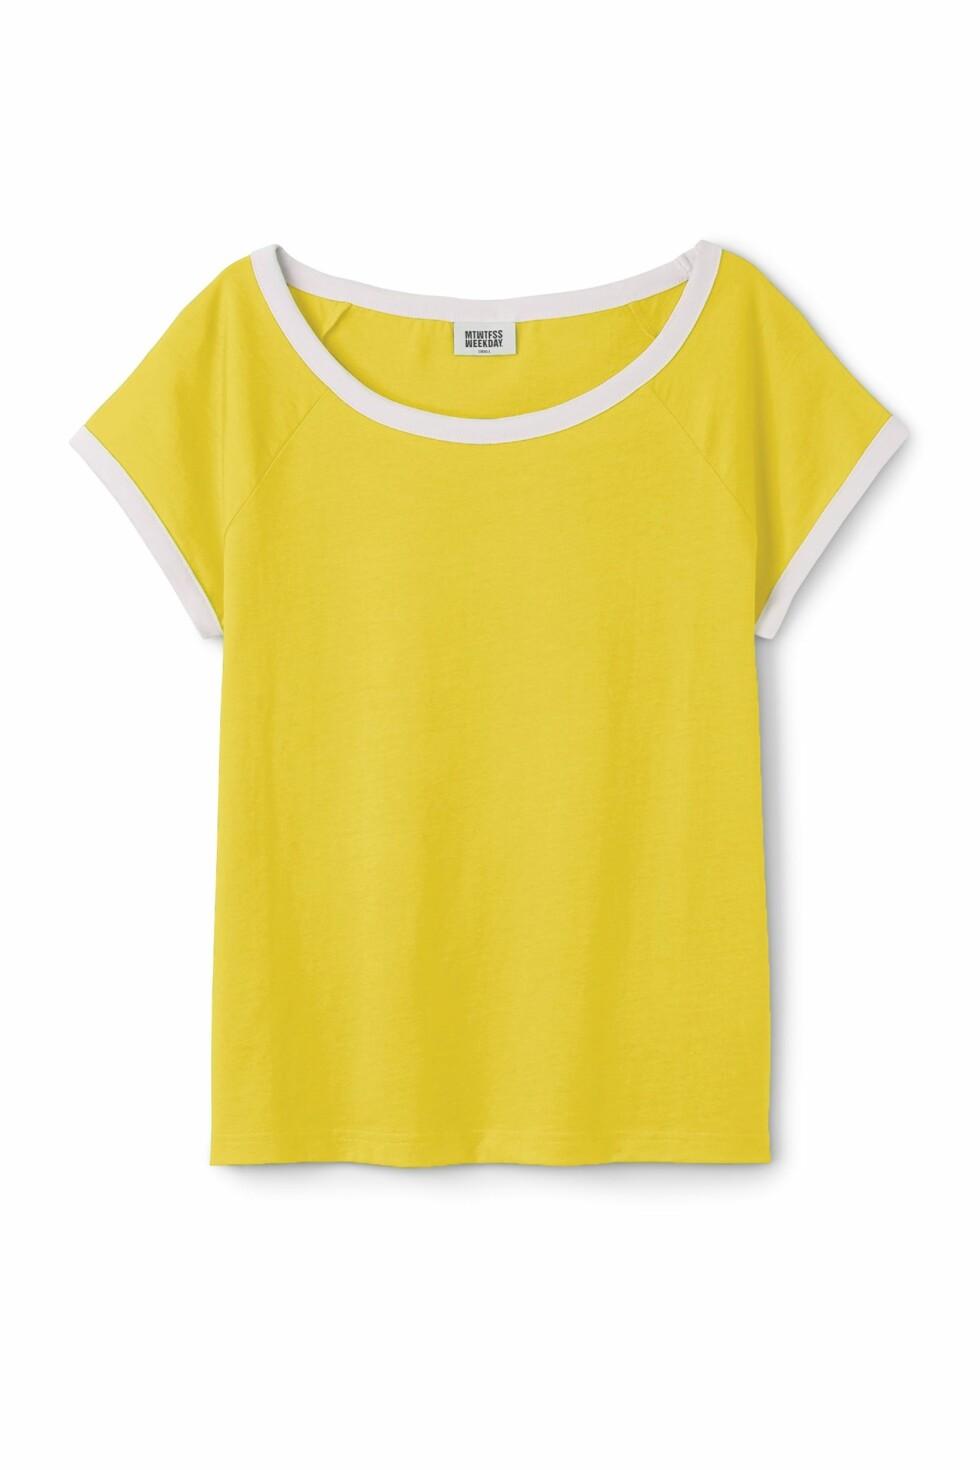 <strong>T-skjorte fra Weekday | kr 150 | http:</strong>//apprl.com/en/pd/4Krq/